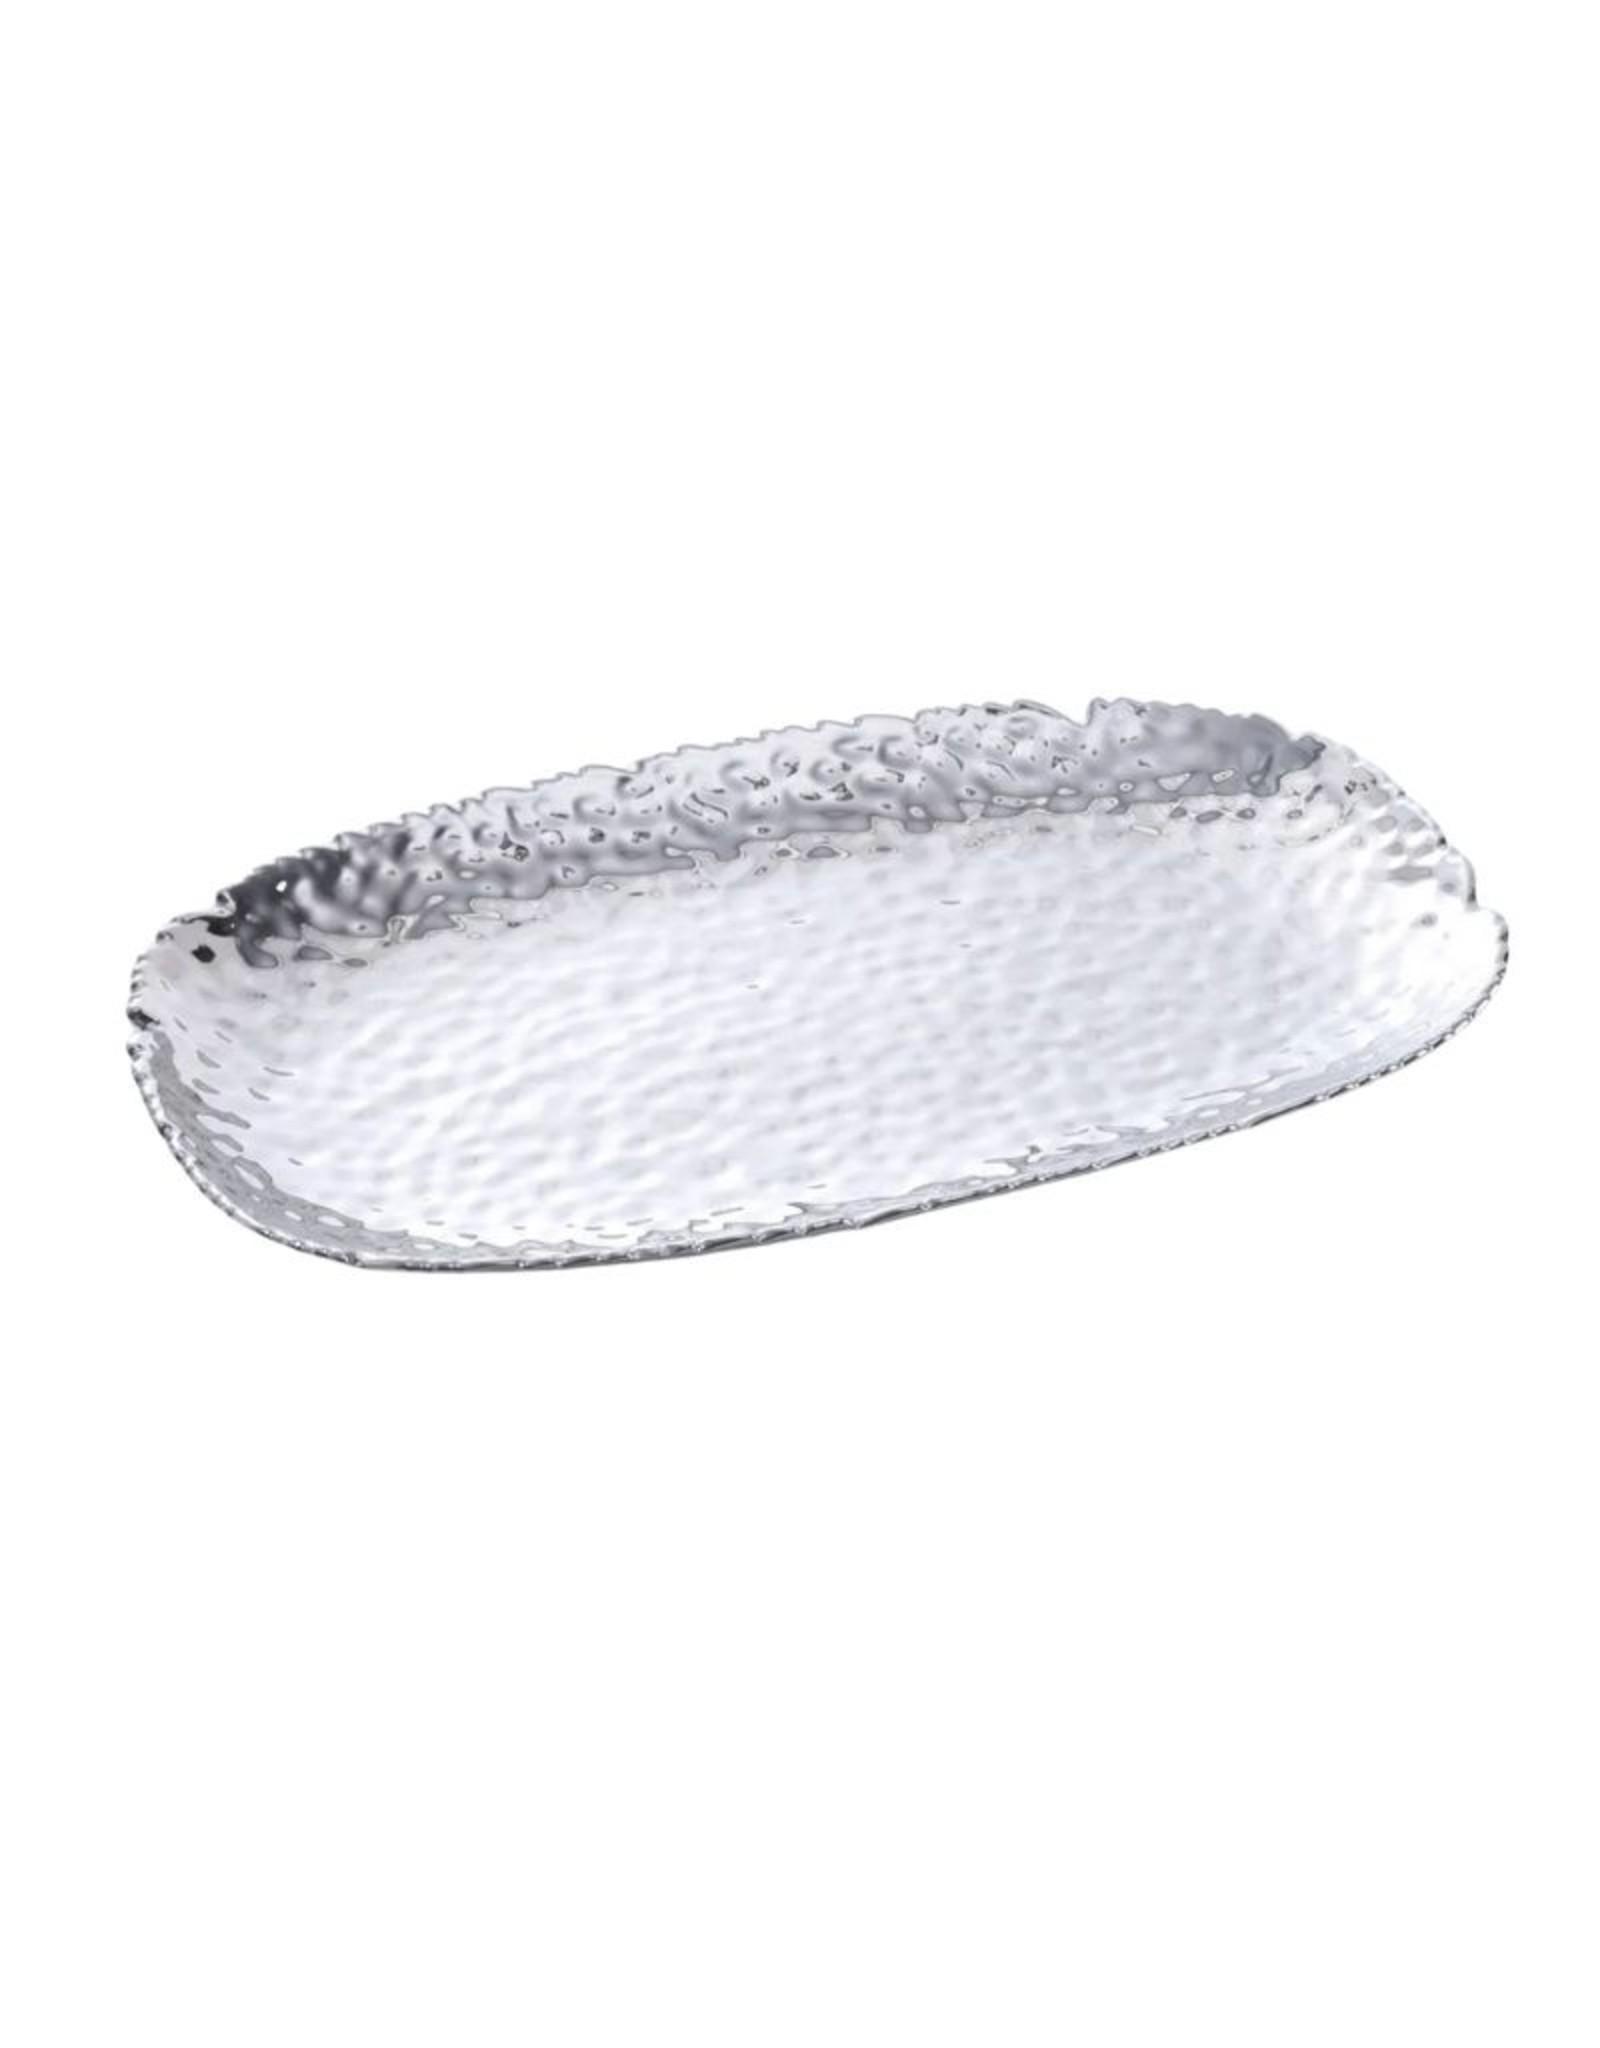 Barbagallo Porcelain Medium Serving Platter